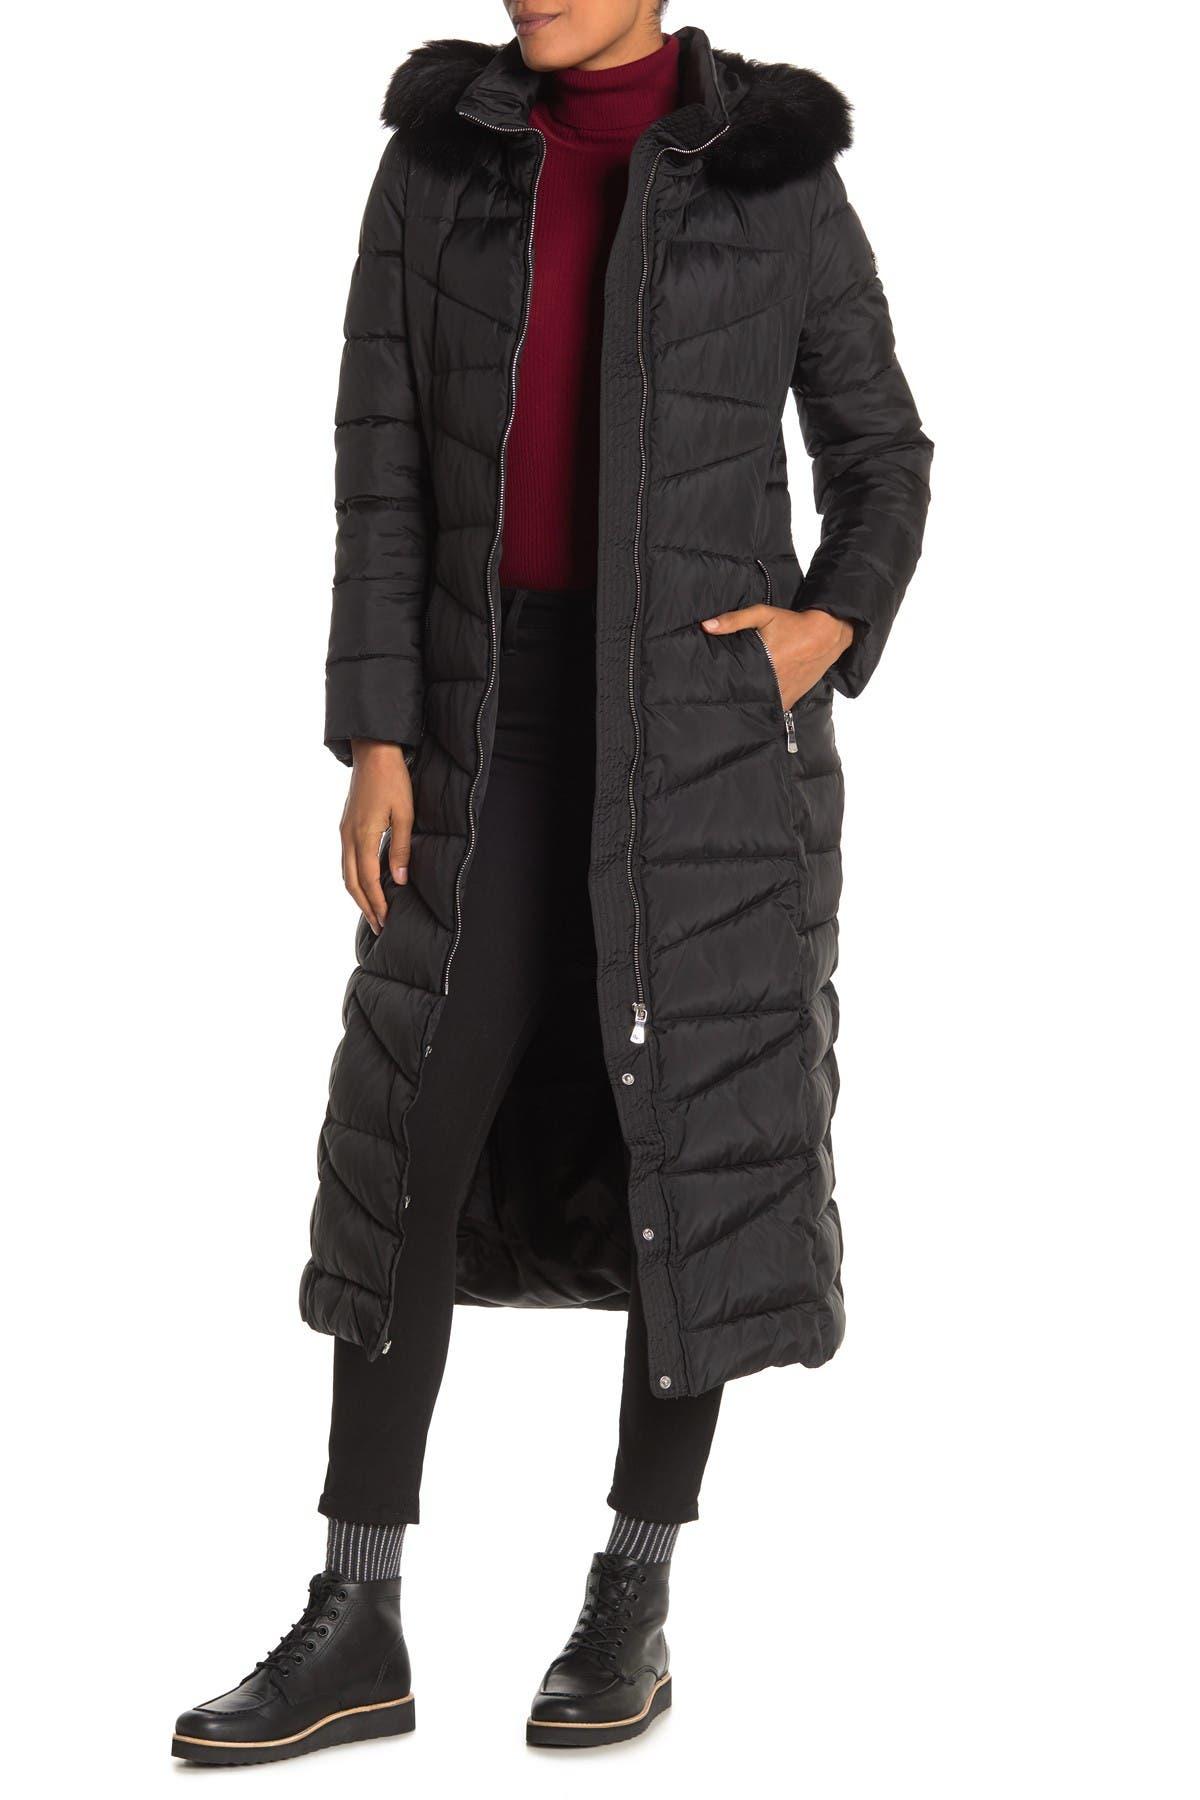 Image of Calvin Klein Long Faux Fur Hooded Jacket